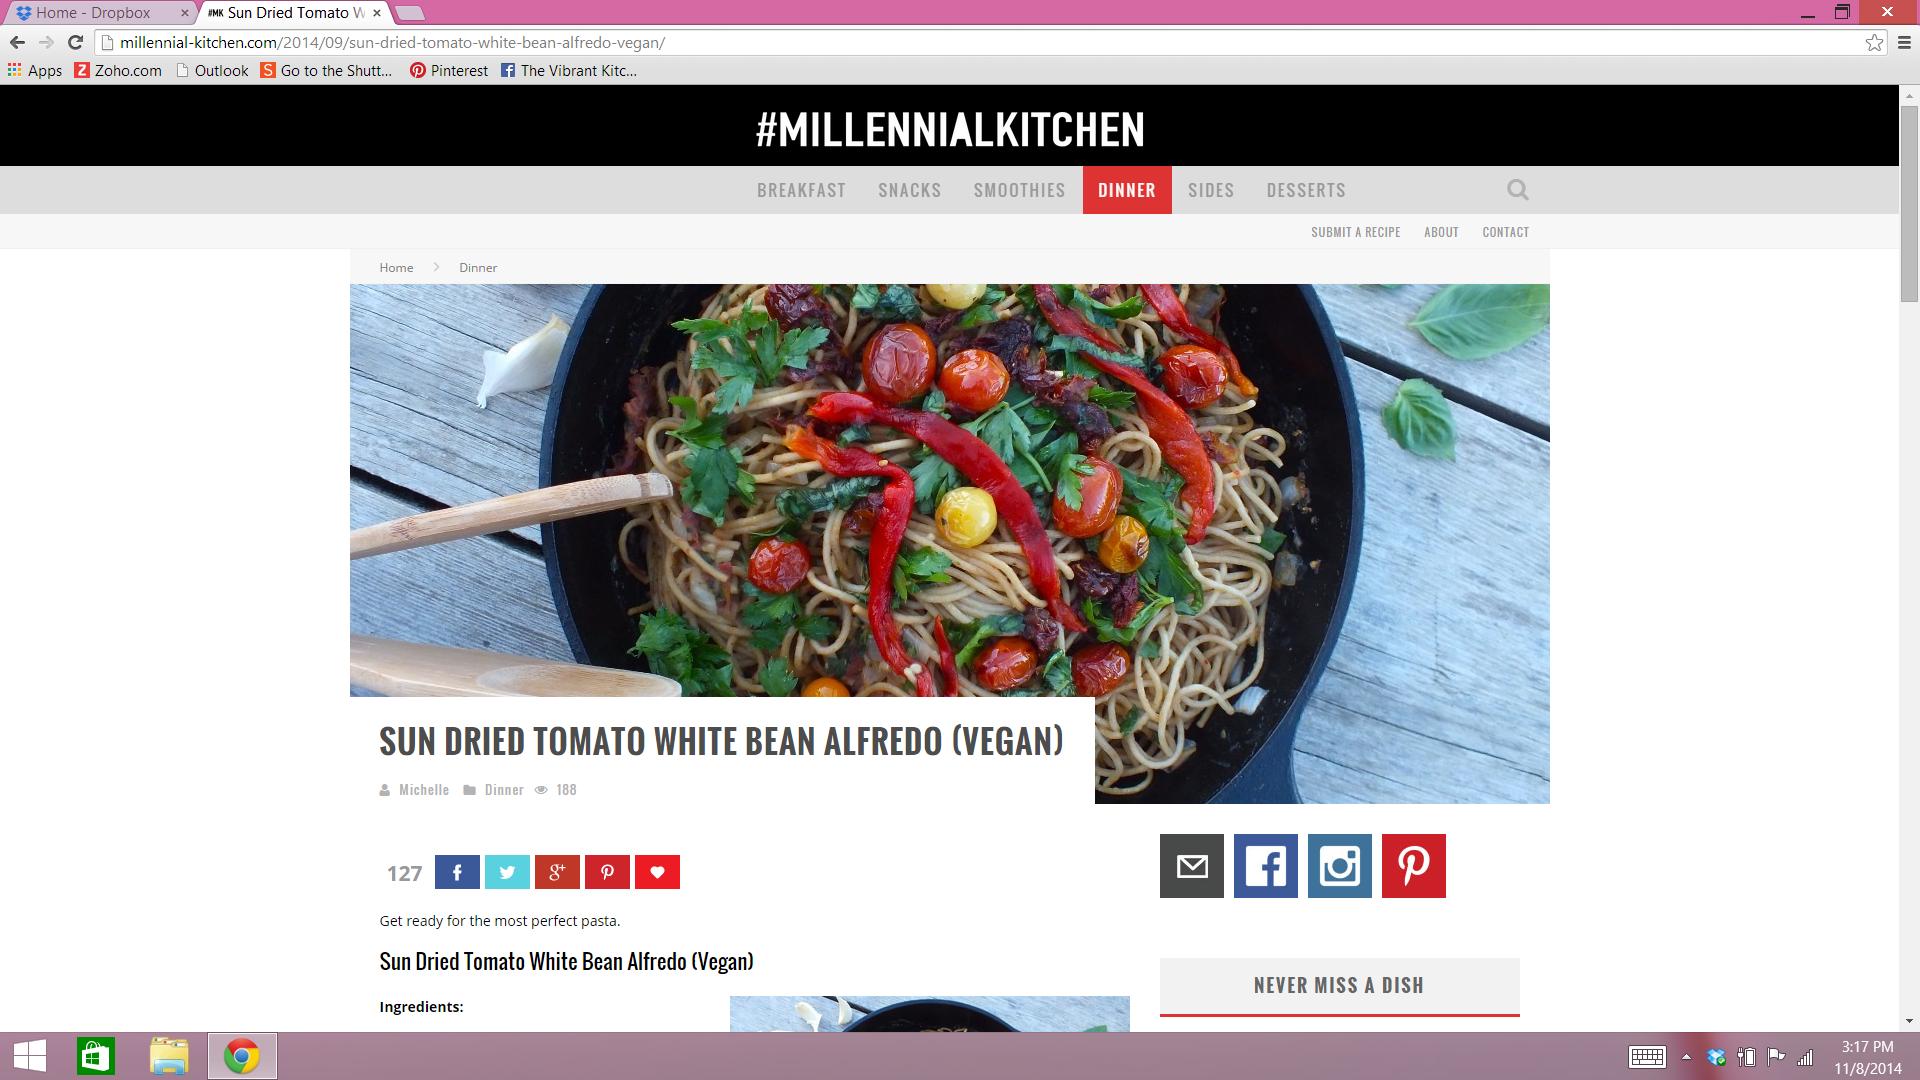 http://millennial-kitchen.com/2014/09/sun-dried-tomato-white-bean-alfredo-vegan/